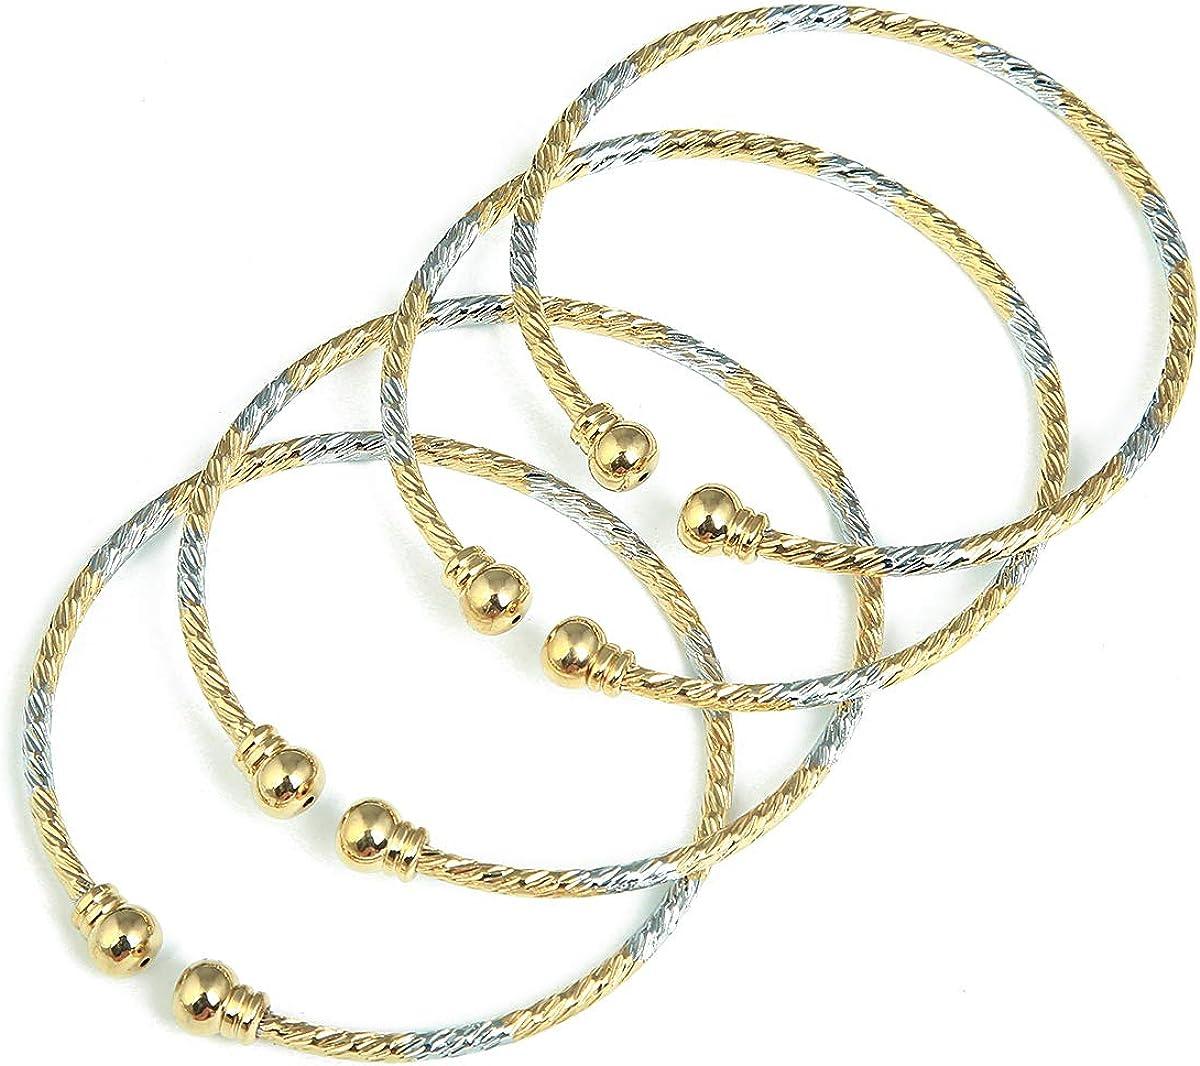 Brass 4pcs Openable Bangle Bracelet Arab Ethiopian Bangle Gold Color Dubai Africa Jewelry Gift